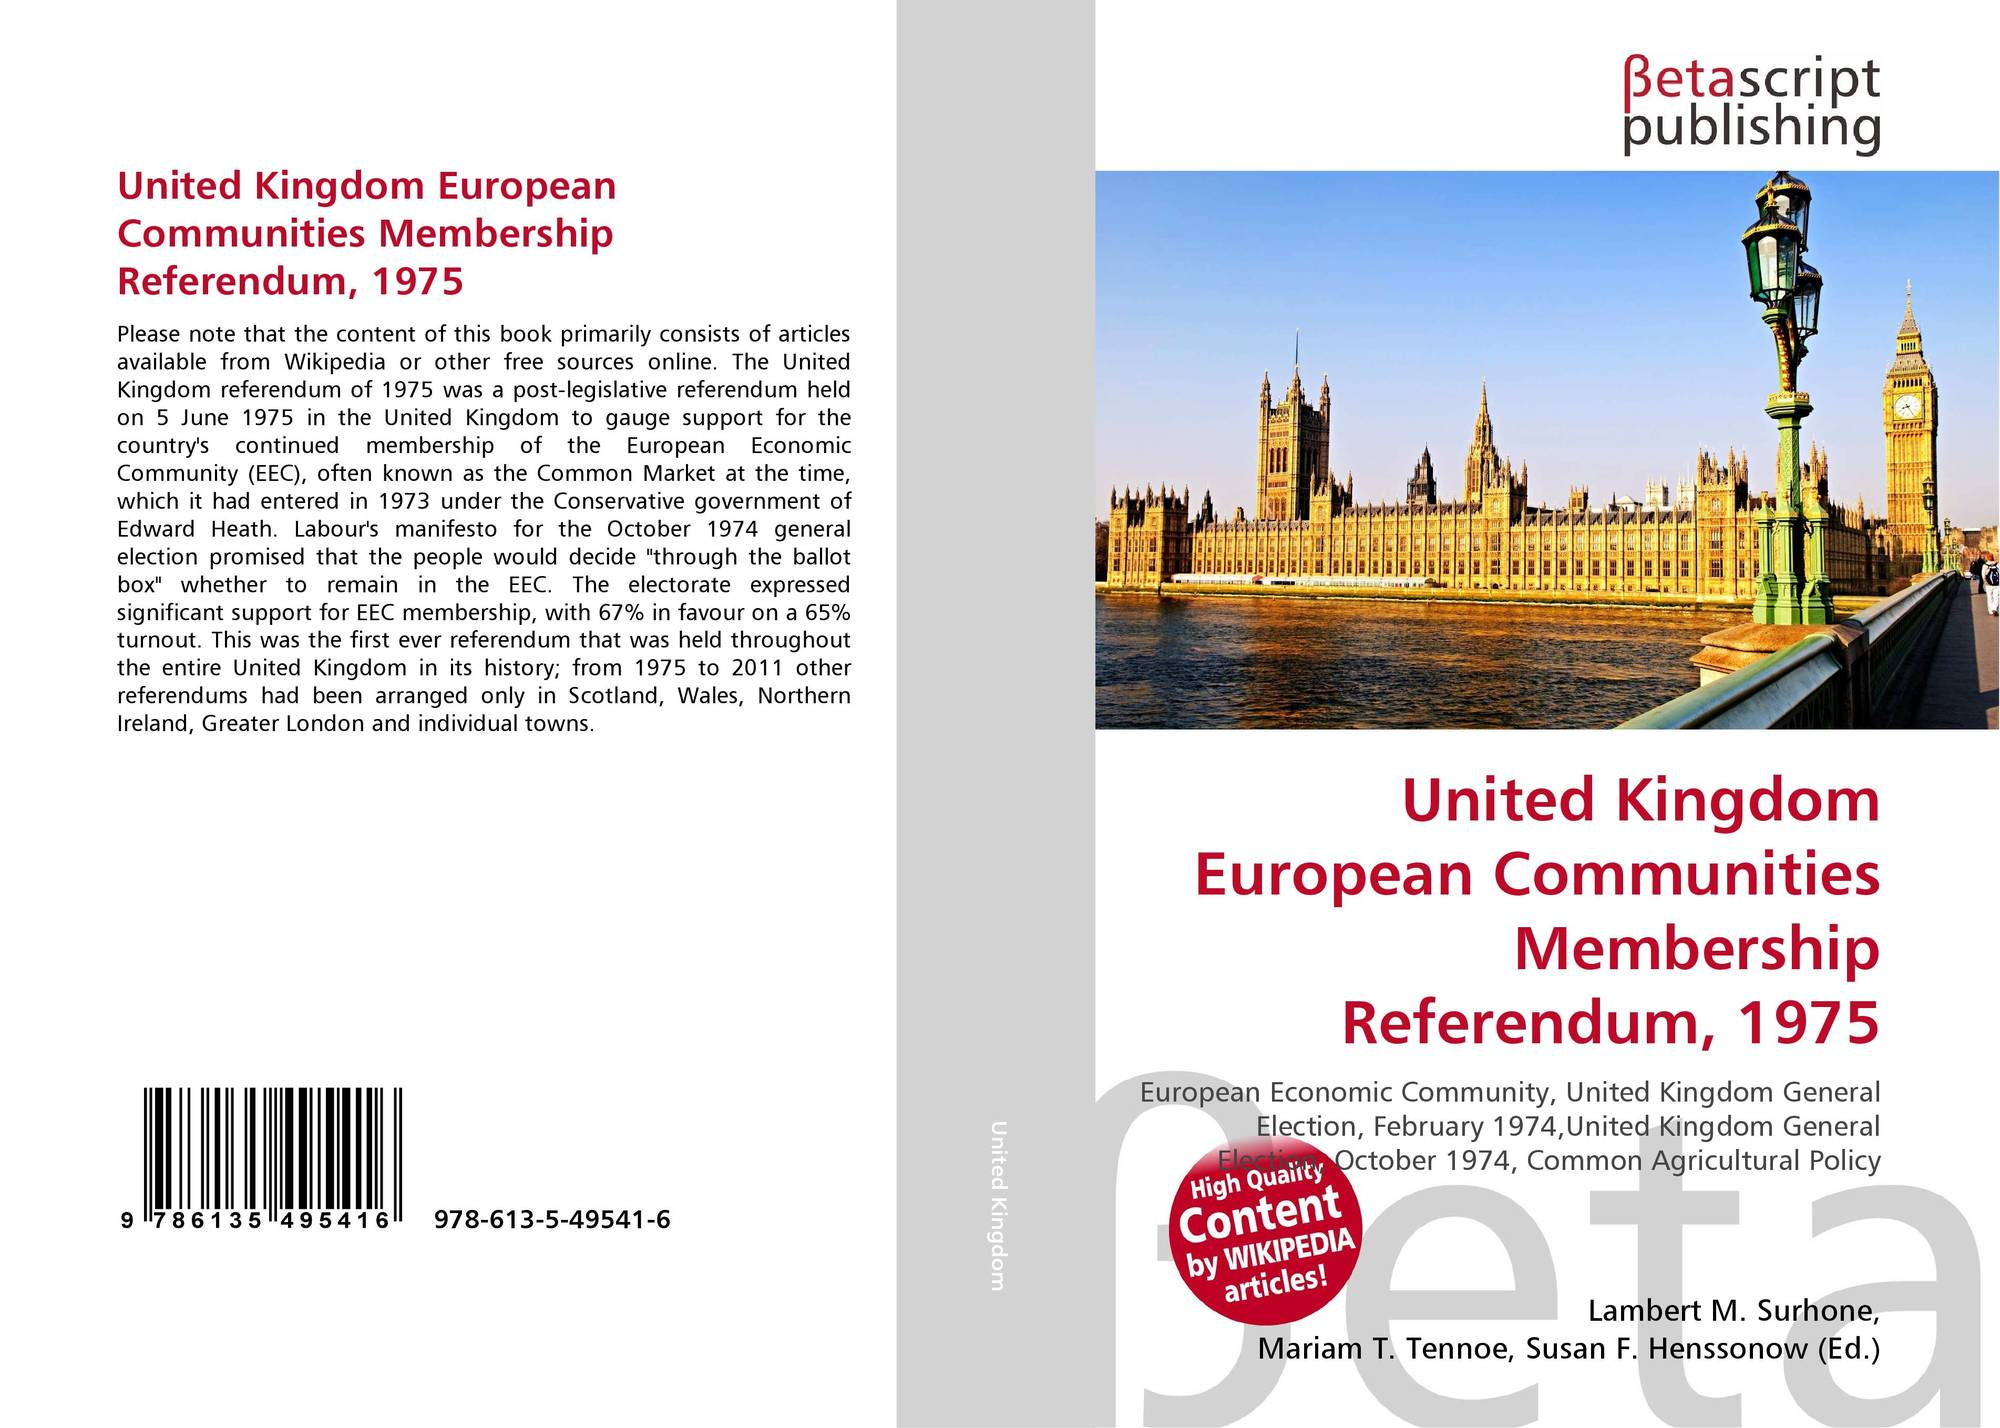 benedict anderson imagined communities full pdf